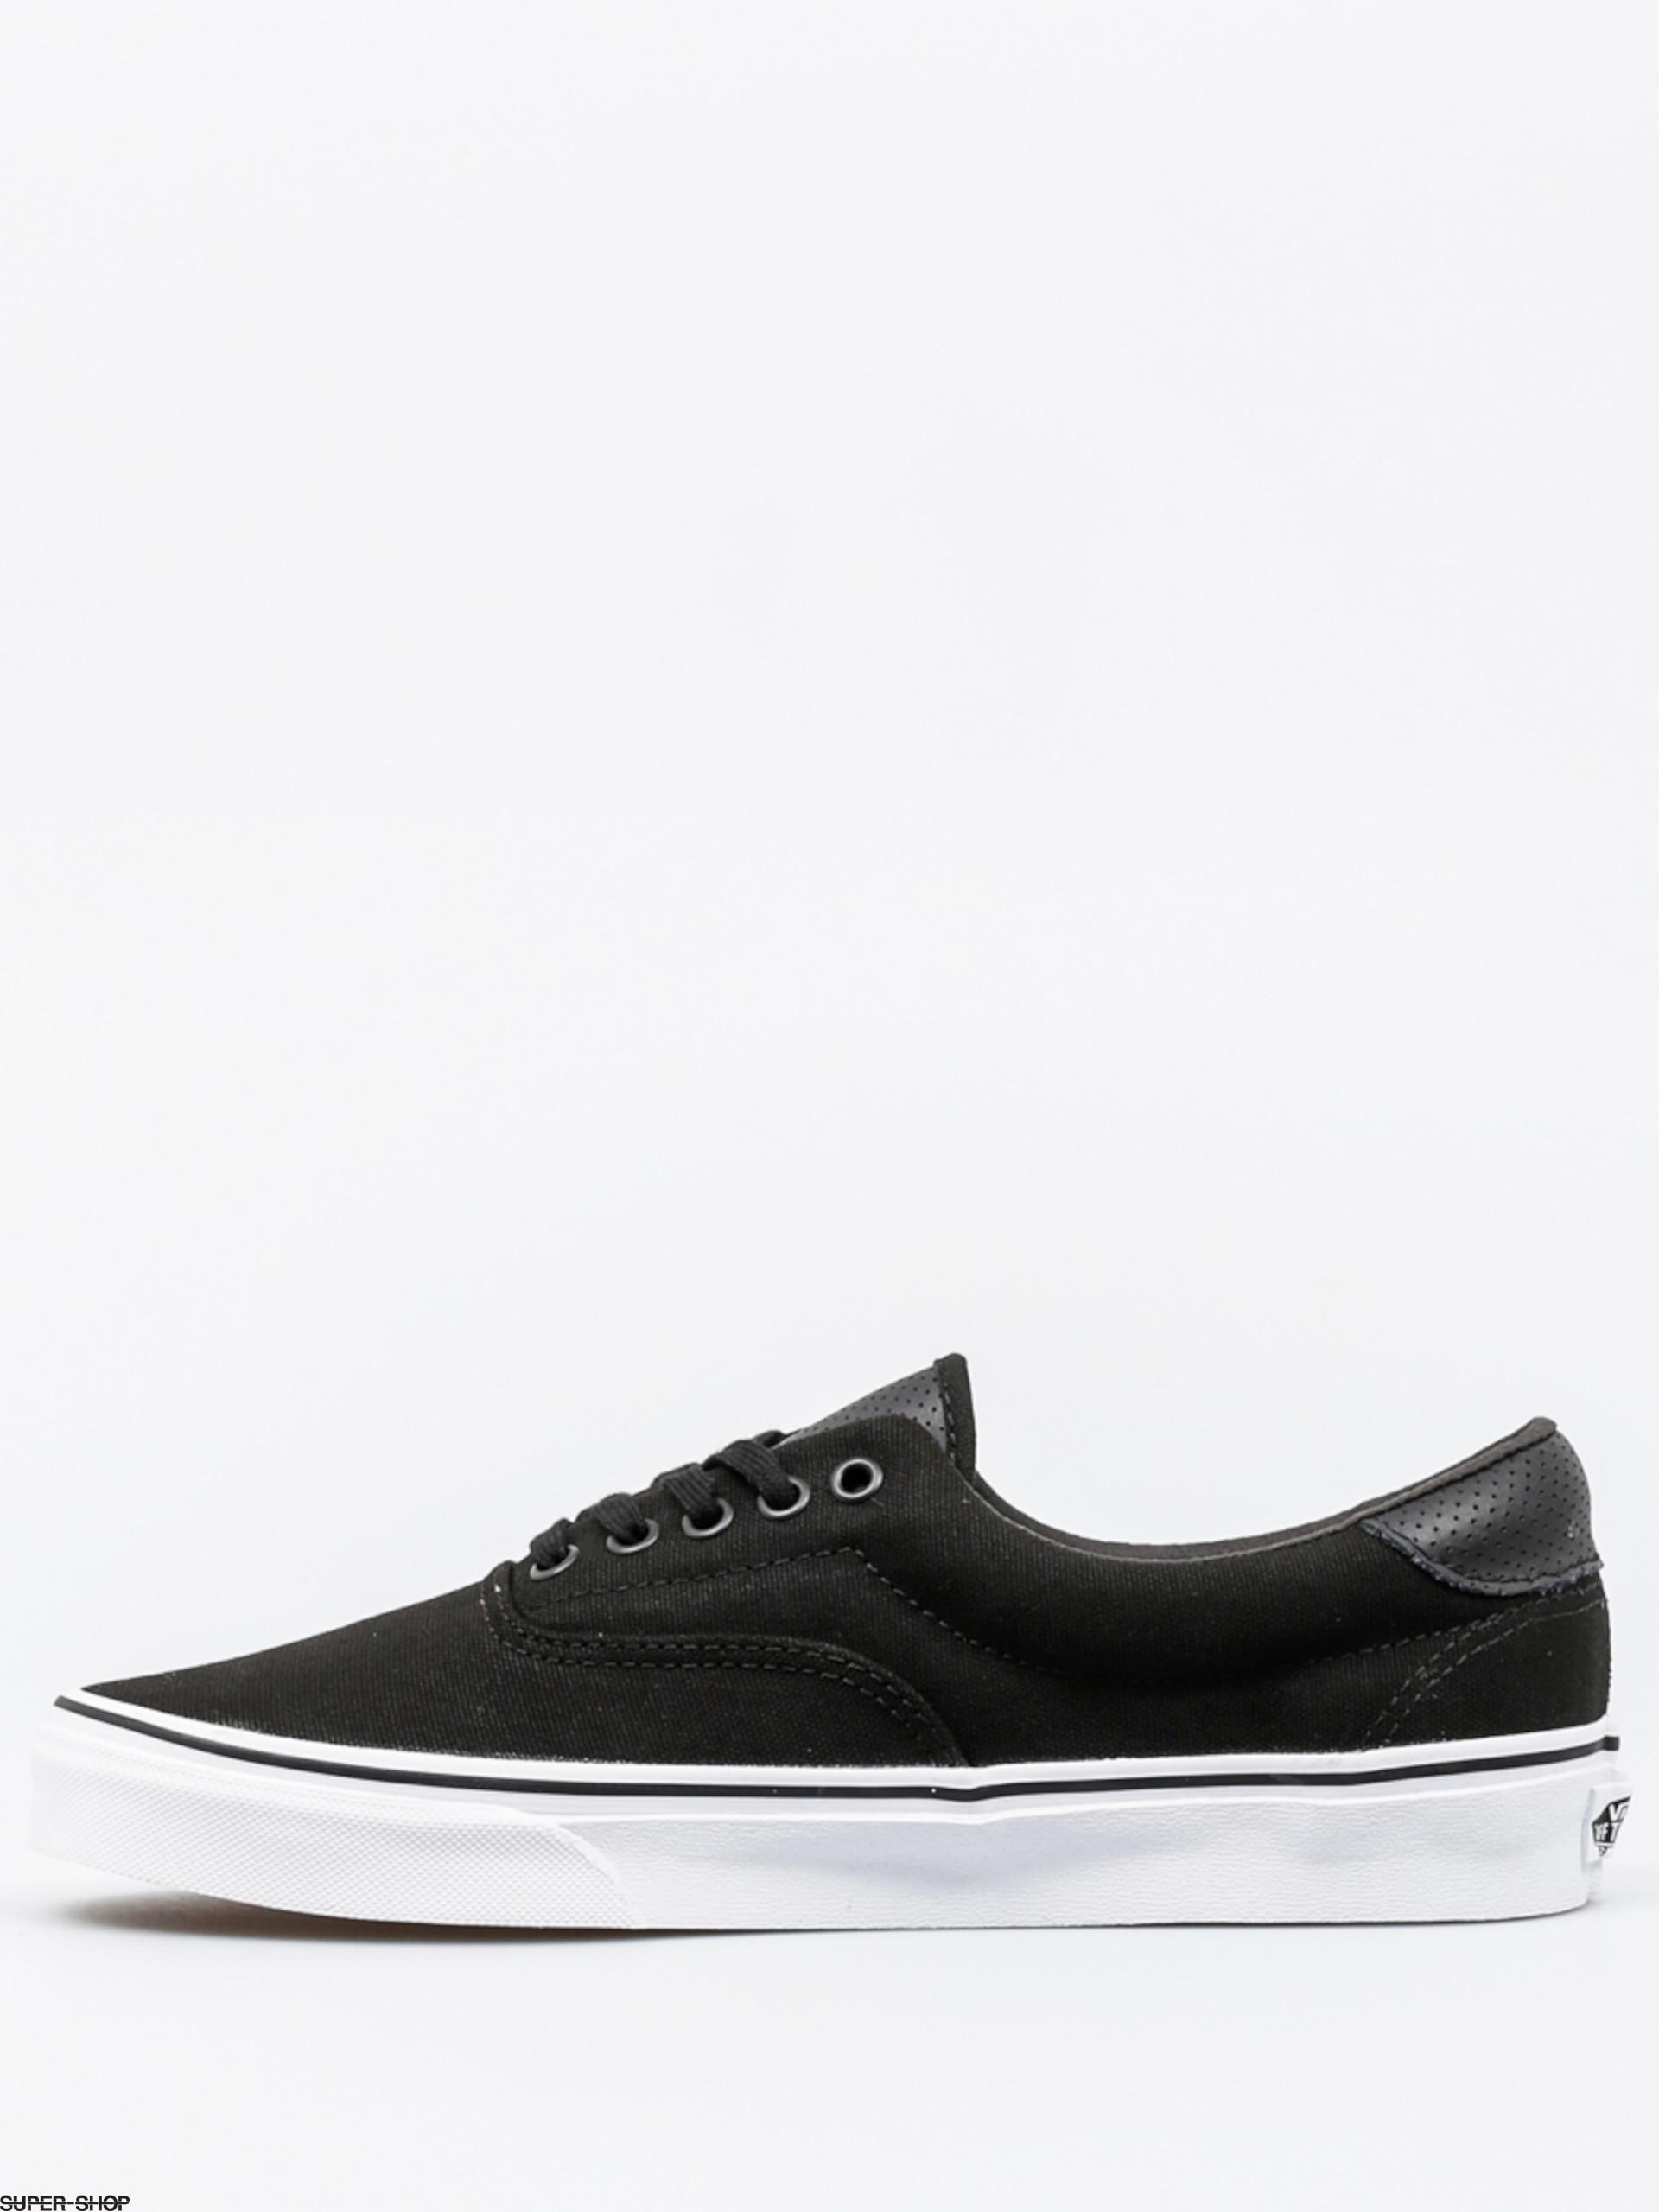 4701111c00 Vans Shoes Era 59 (c p black true white)